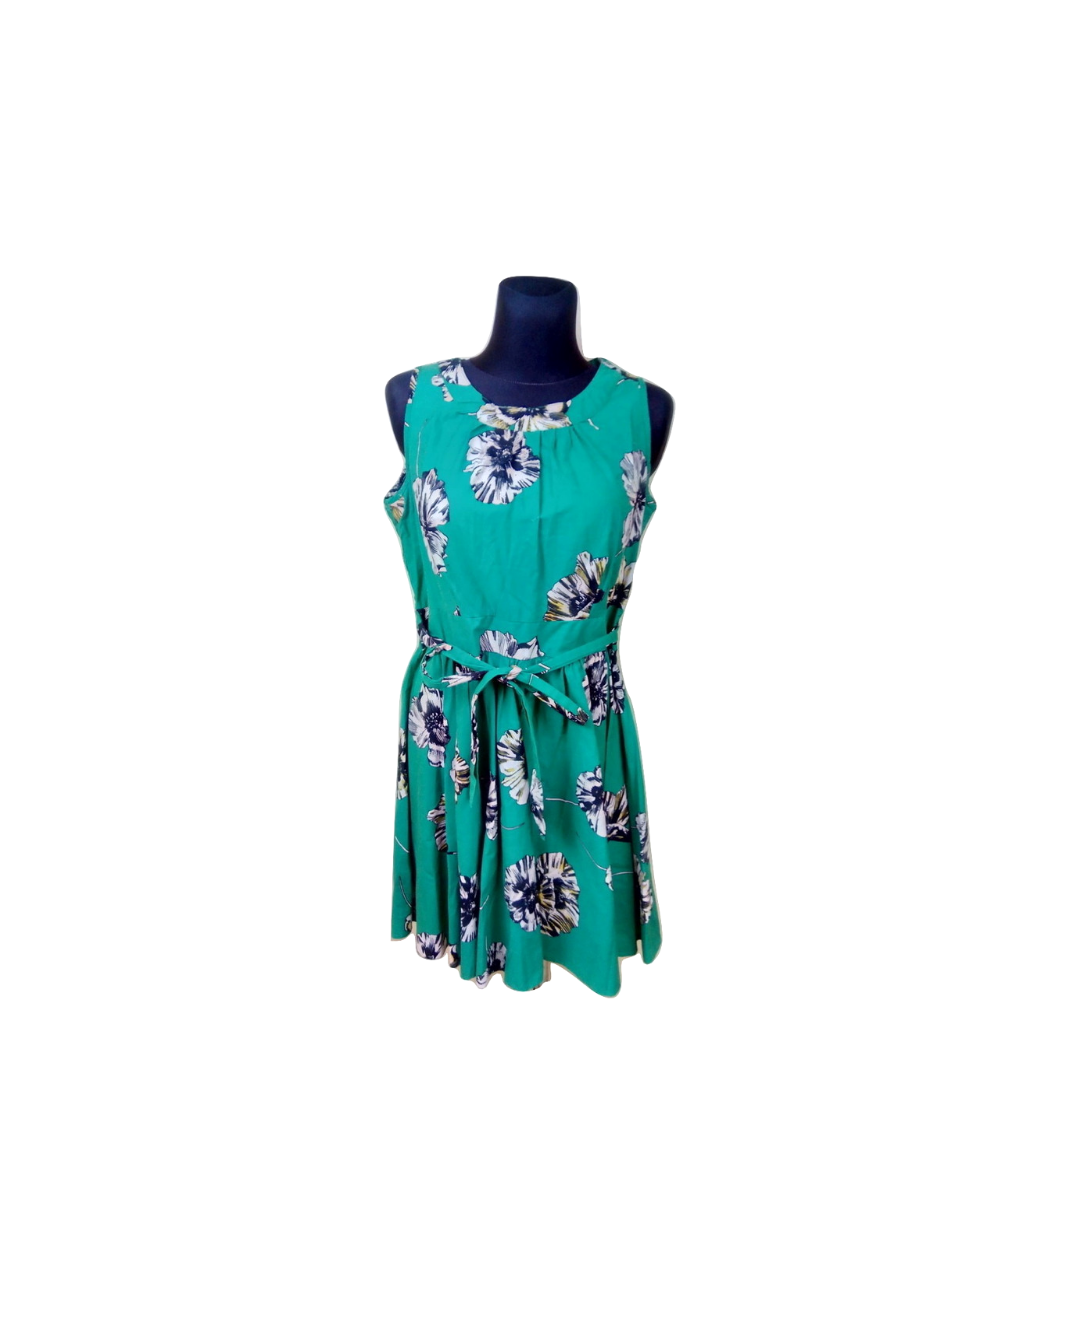 Žalia suknelė, DOROTHY PERKINS, 44 dydis